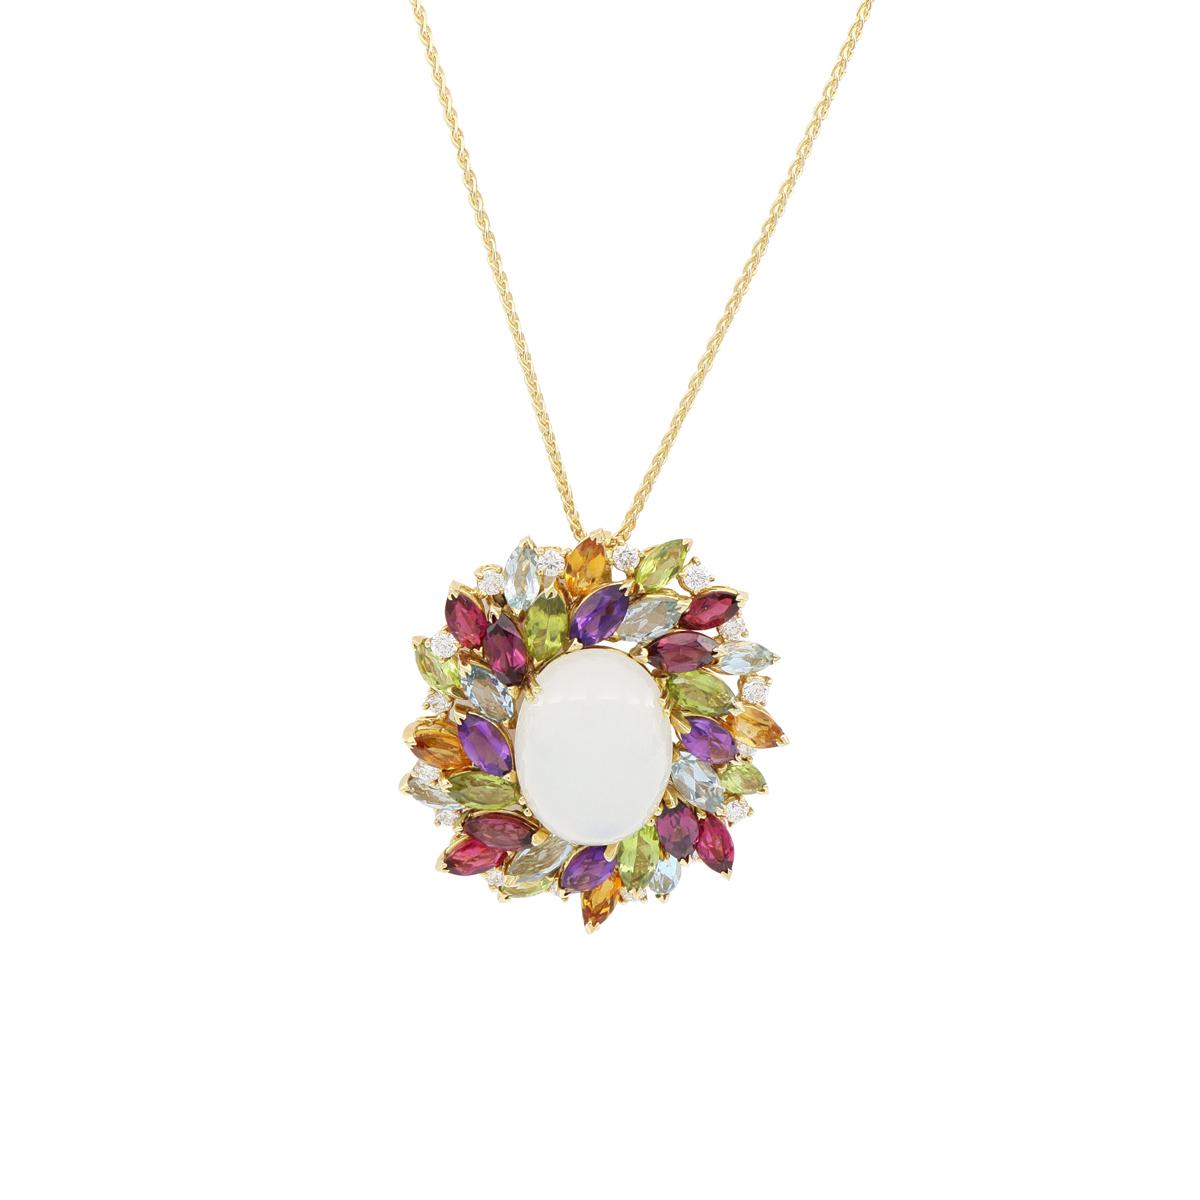 Multi-Gem Moonlight Pendant Necklace